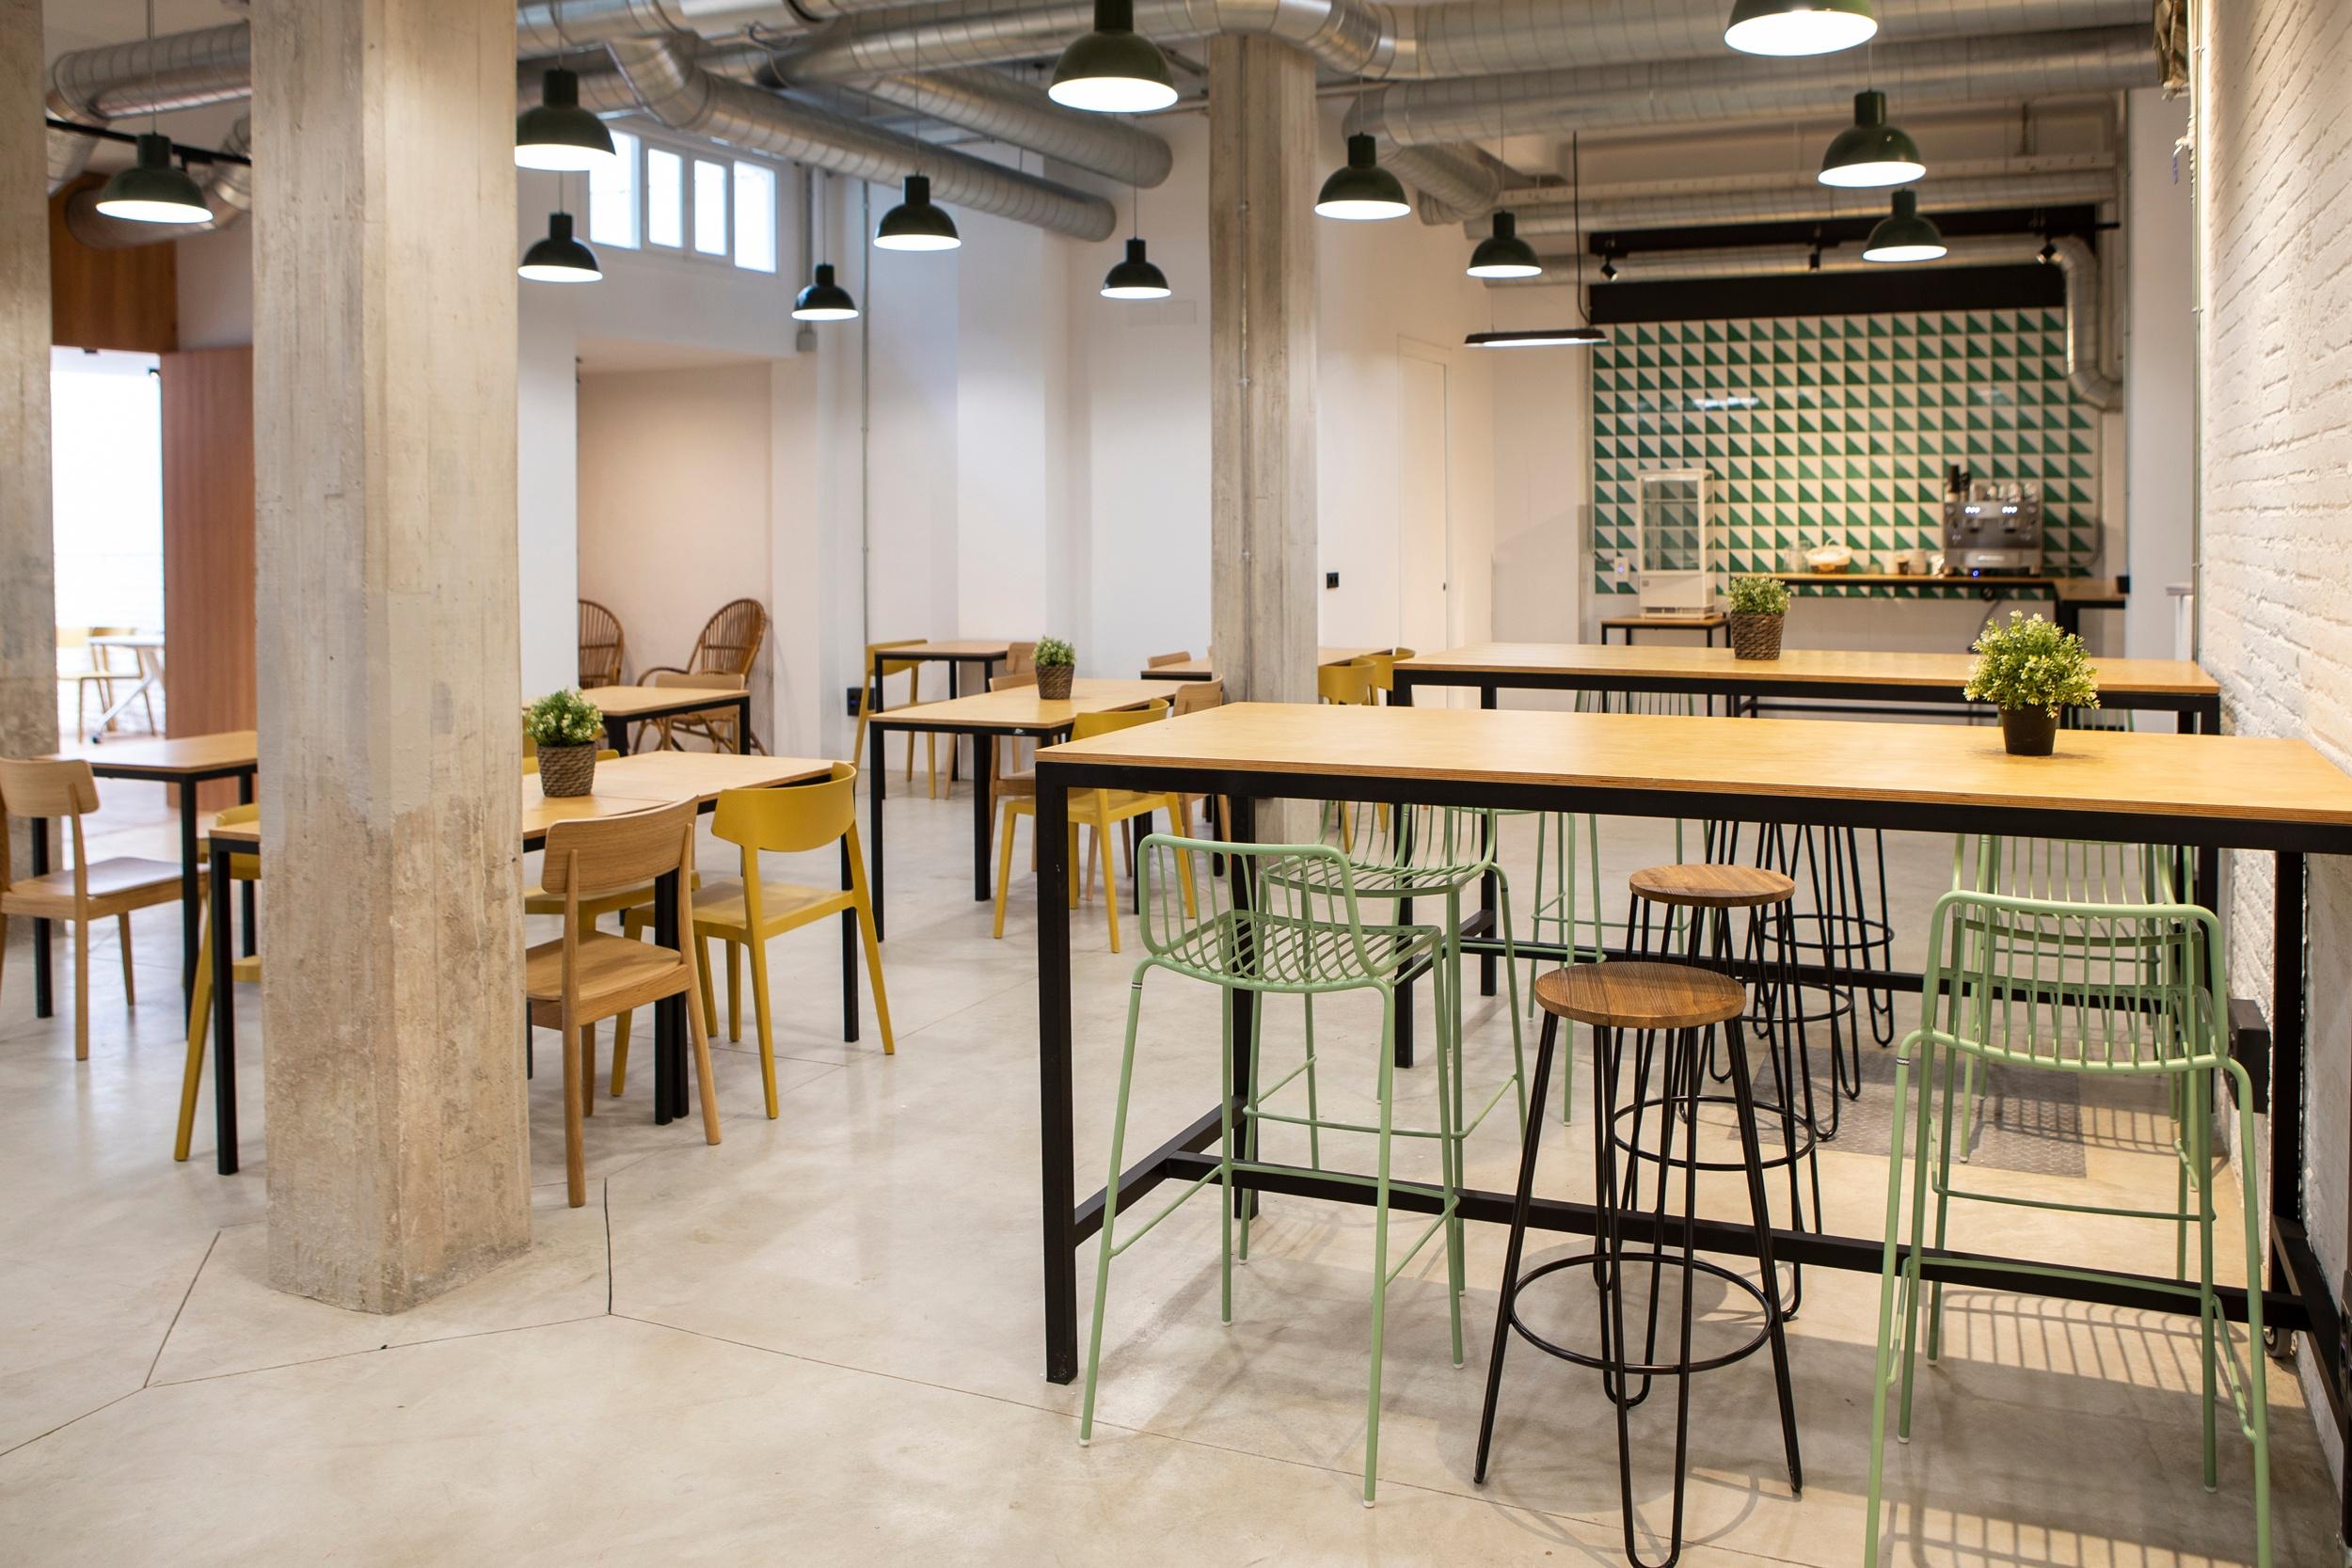 Cafeteria wayco ruzafa